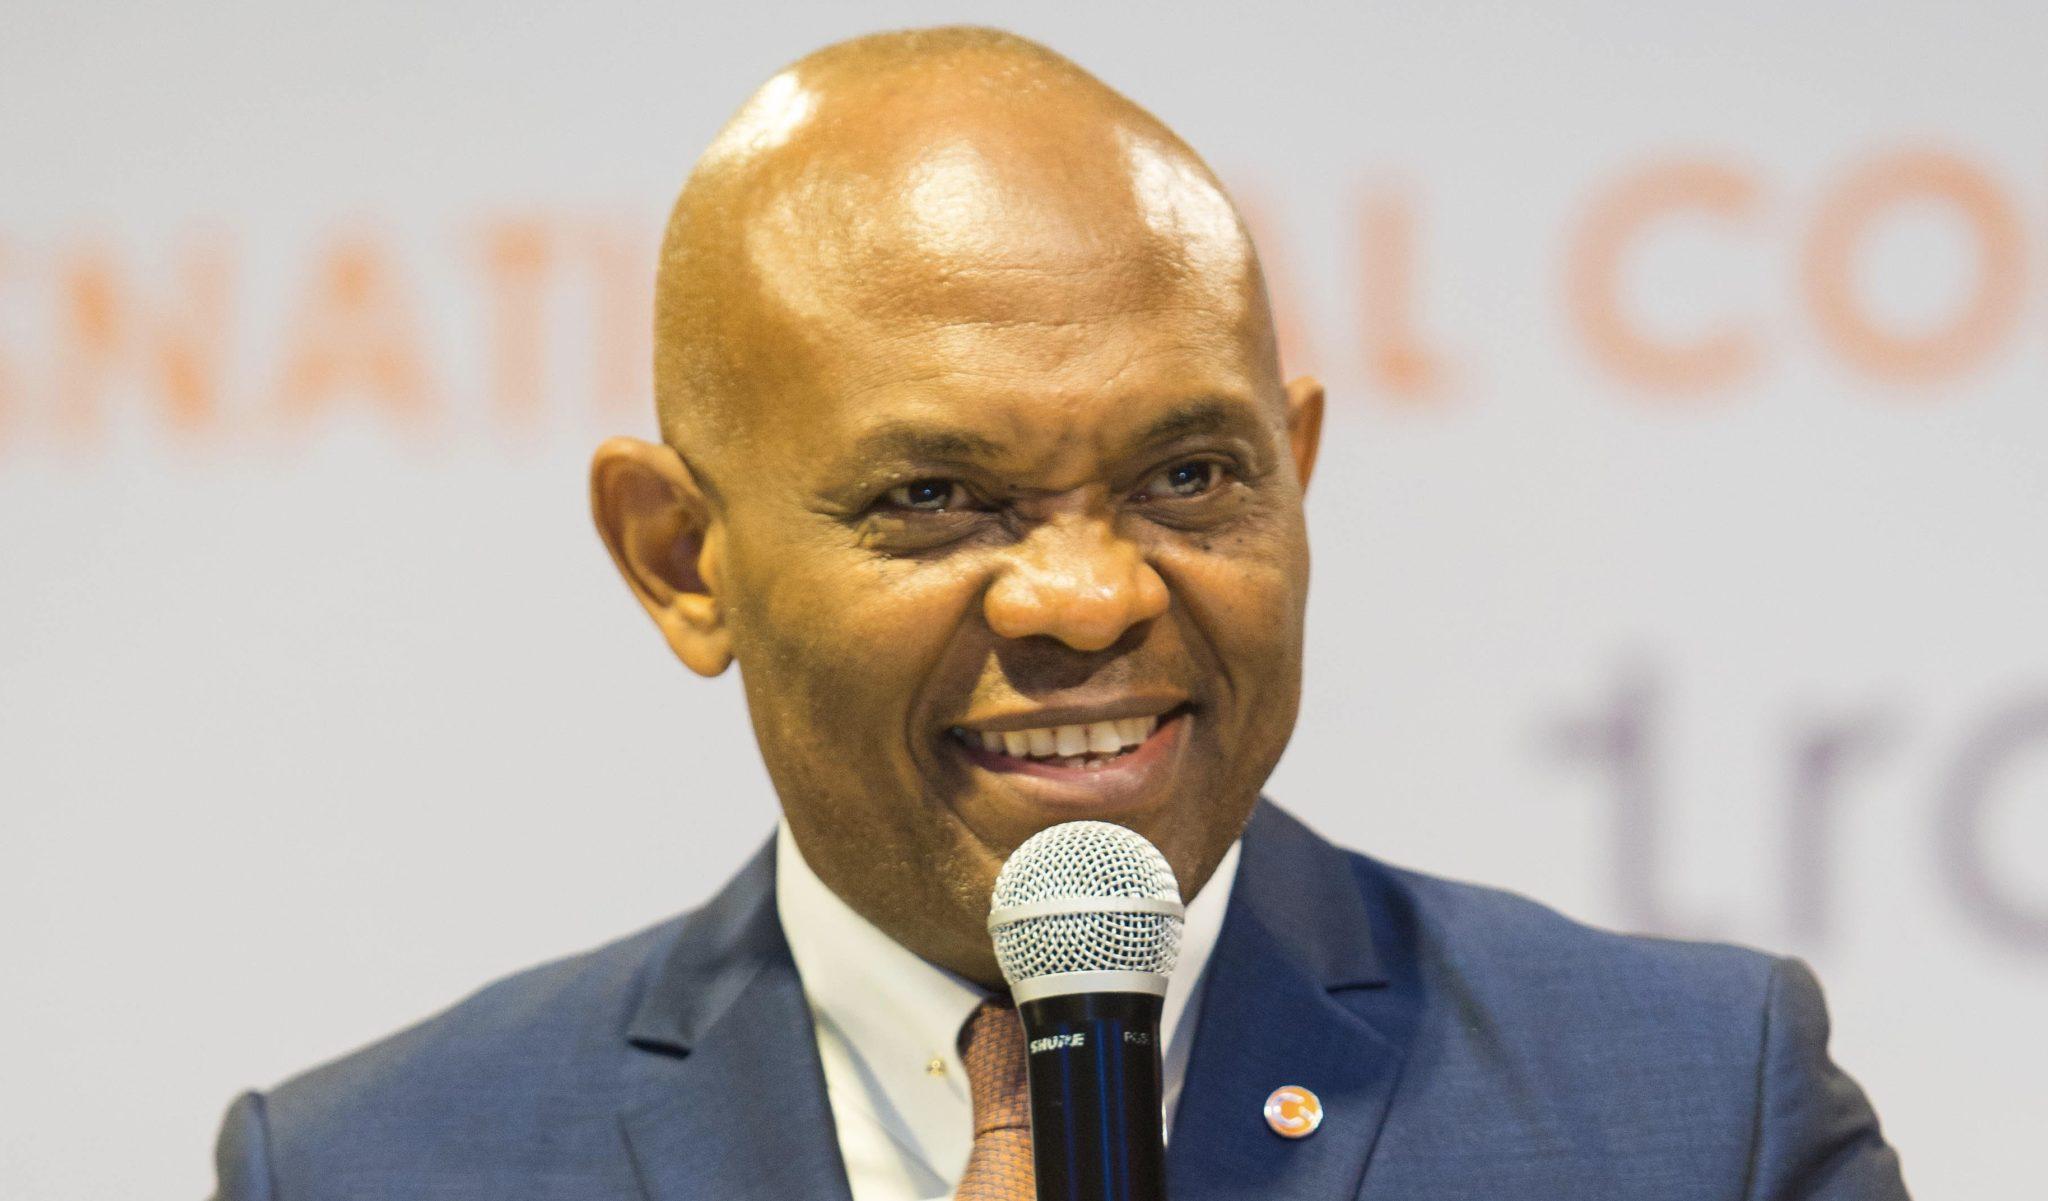 COVID-19 is the perfect opportunity to 'reset' Africa - UBA Chairman Tony Elumelu